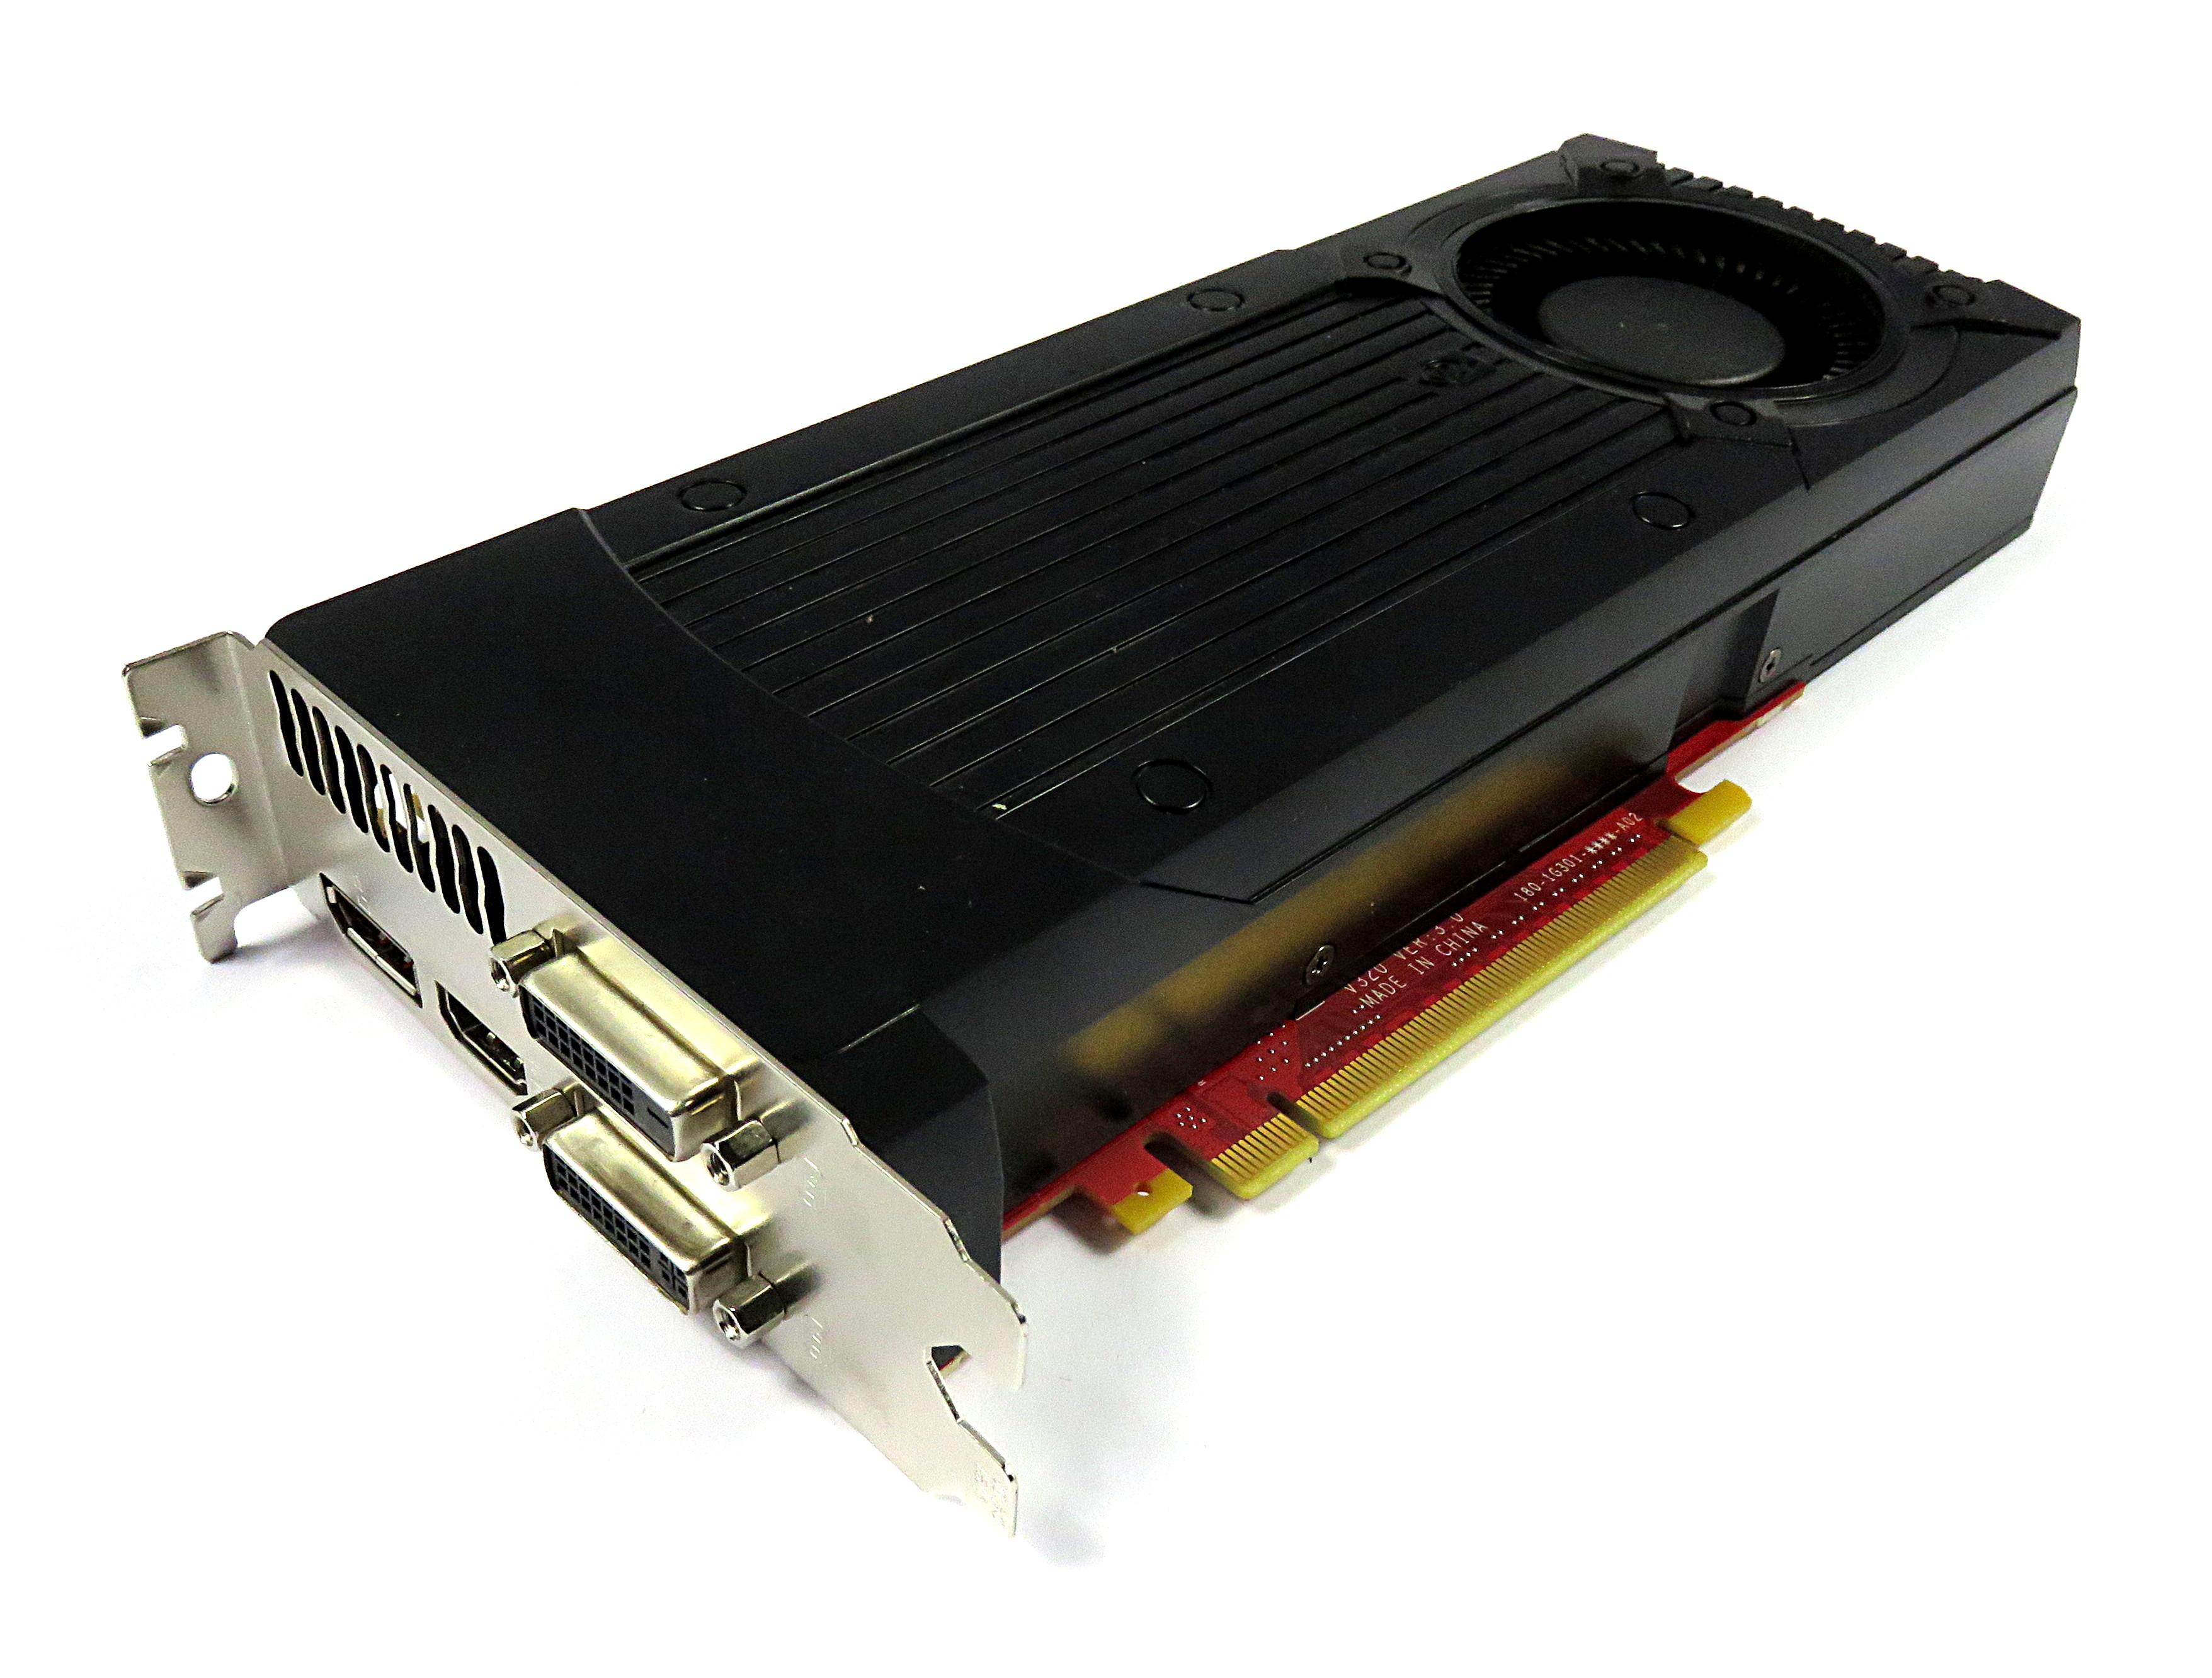 Lenovo 00PC569 MSI nVidia GeForce GTX 960 2GB Graphics Card w/ DP/HDMI/2xDVI